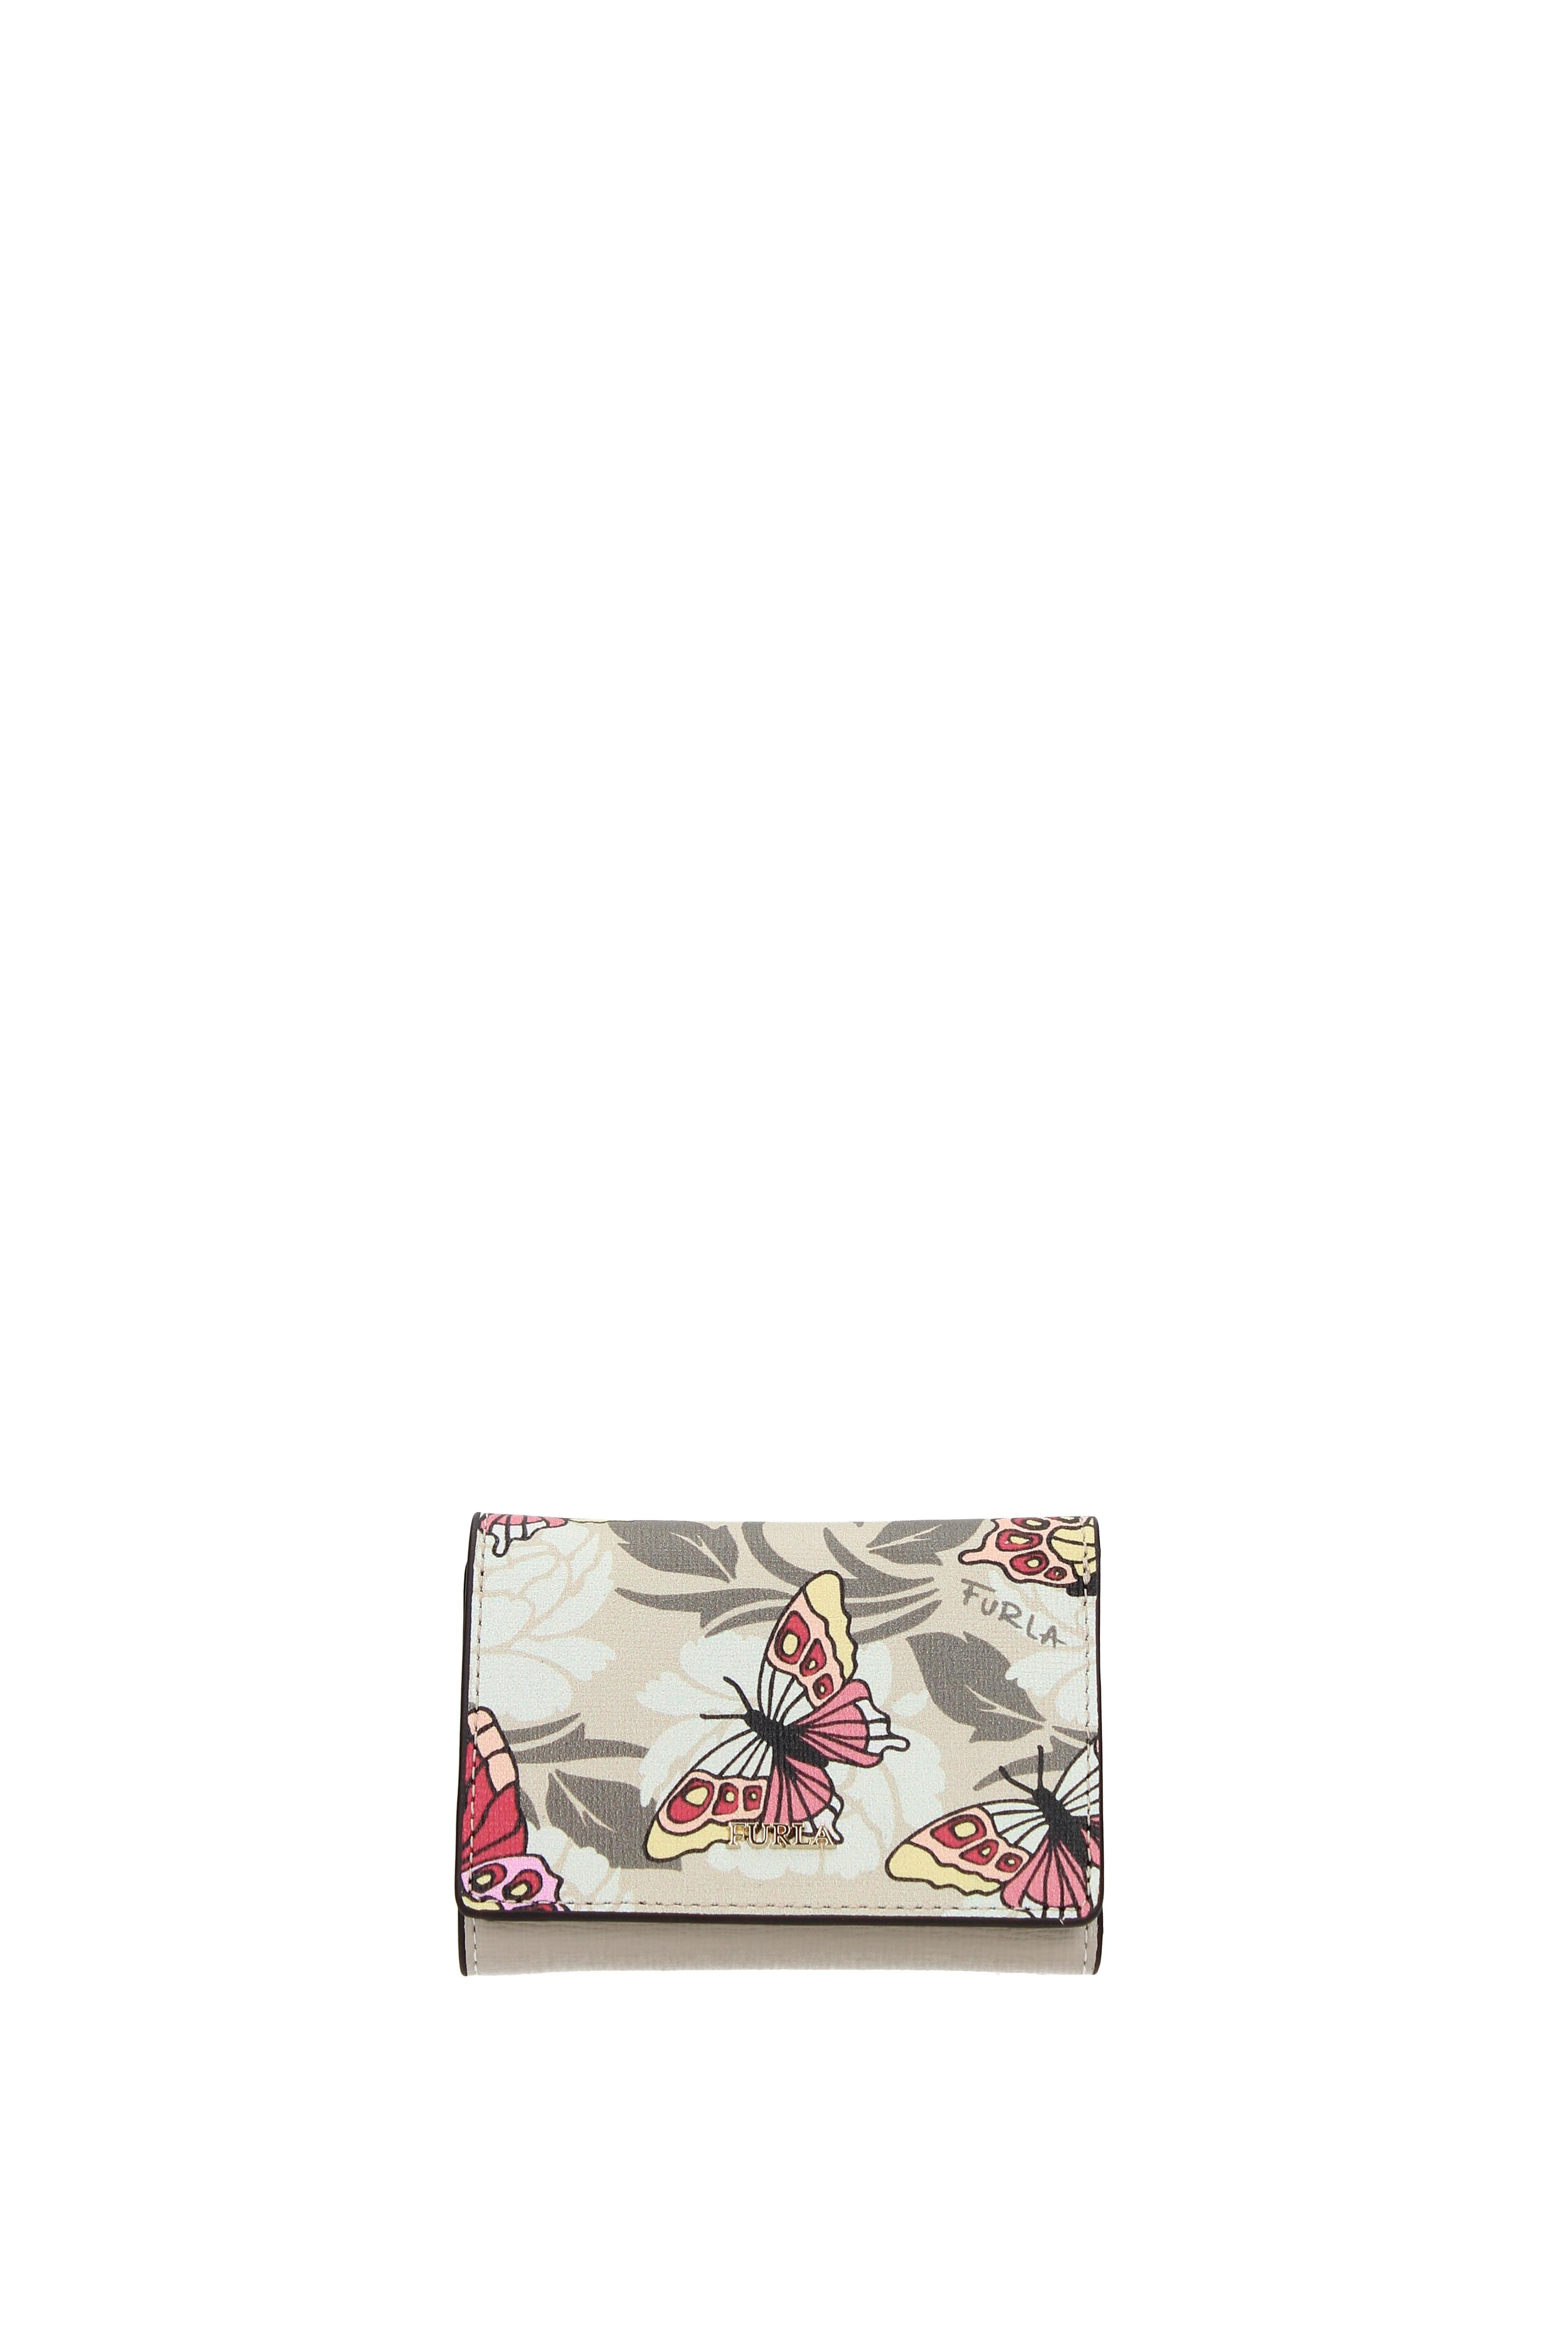 Portafogli-Furla-babylon-Donna-Pelle-BABYLONPPU36B219226